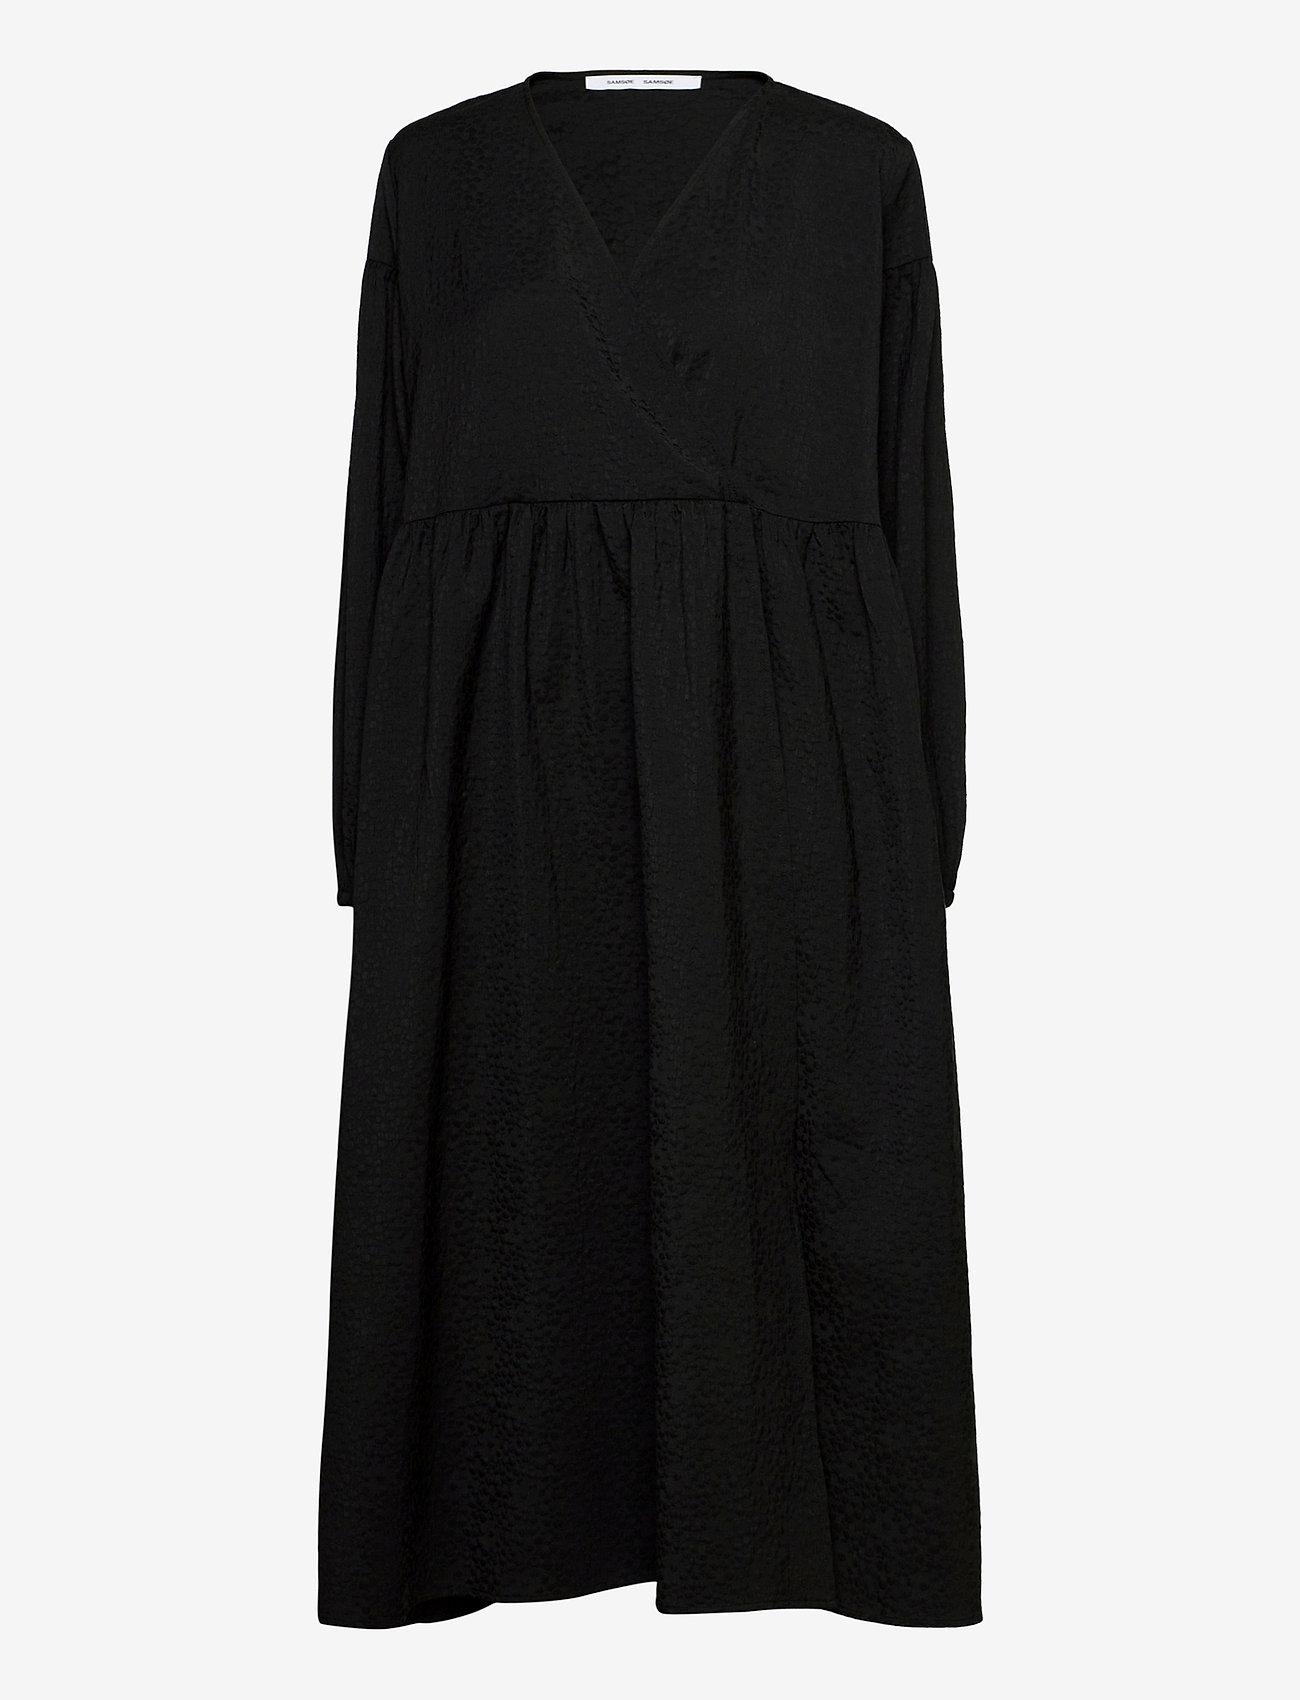 Samsøe Samsøe - Jolie dress 11402 - black flower - 1